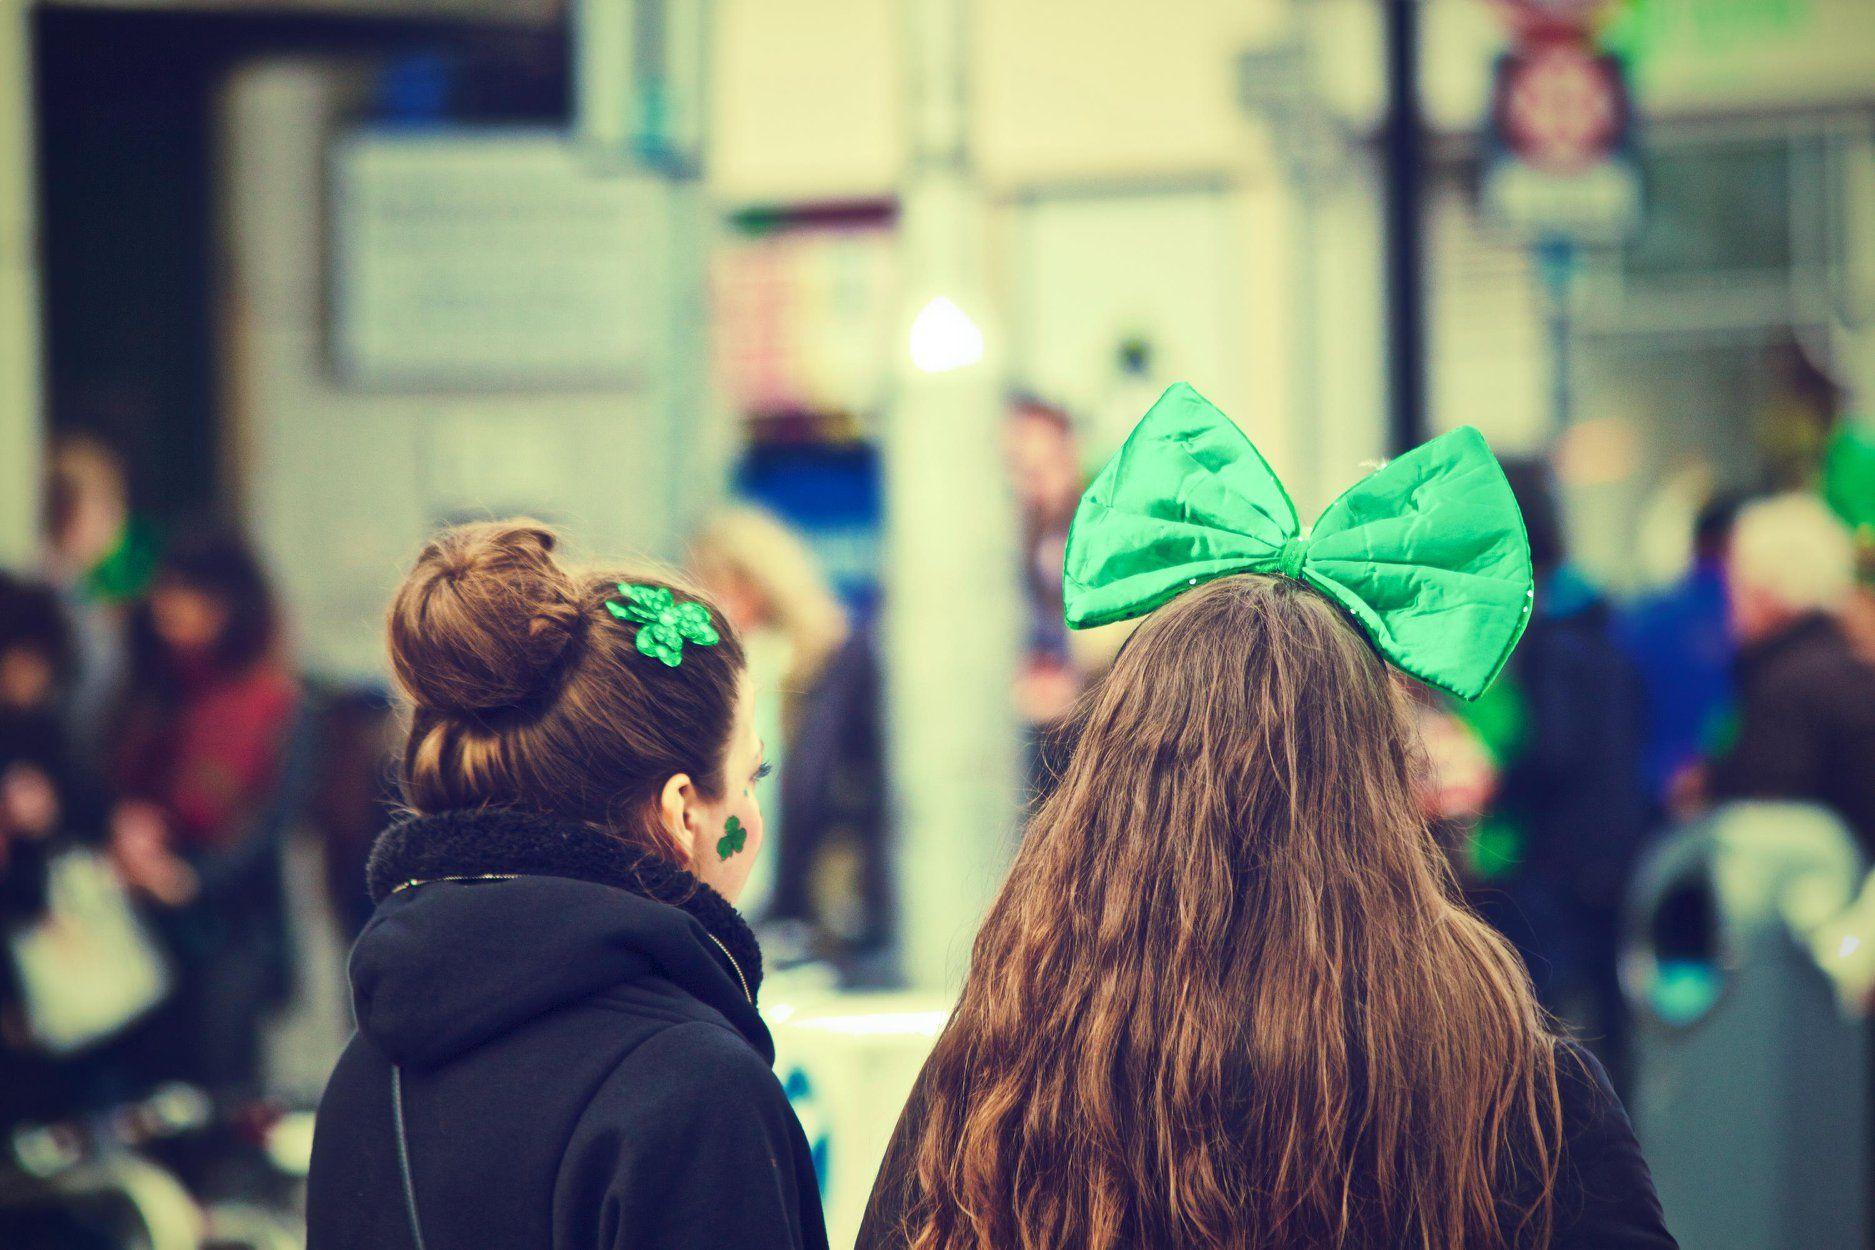 Paris Food & Drink Events: St Patrick's Day Parade Paris